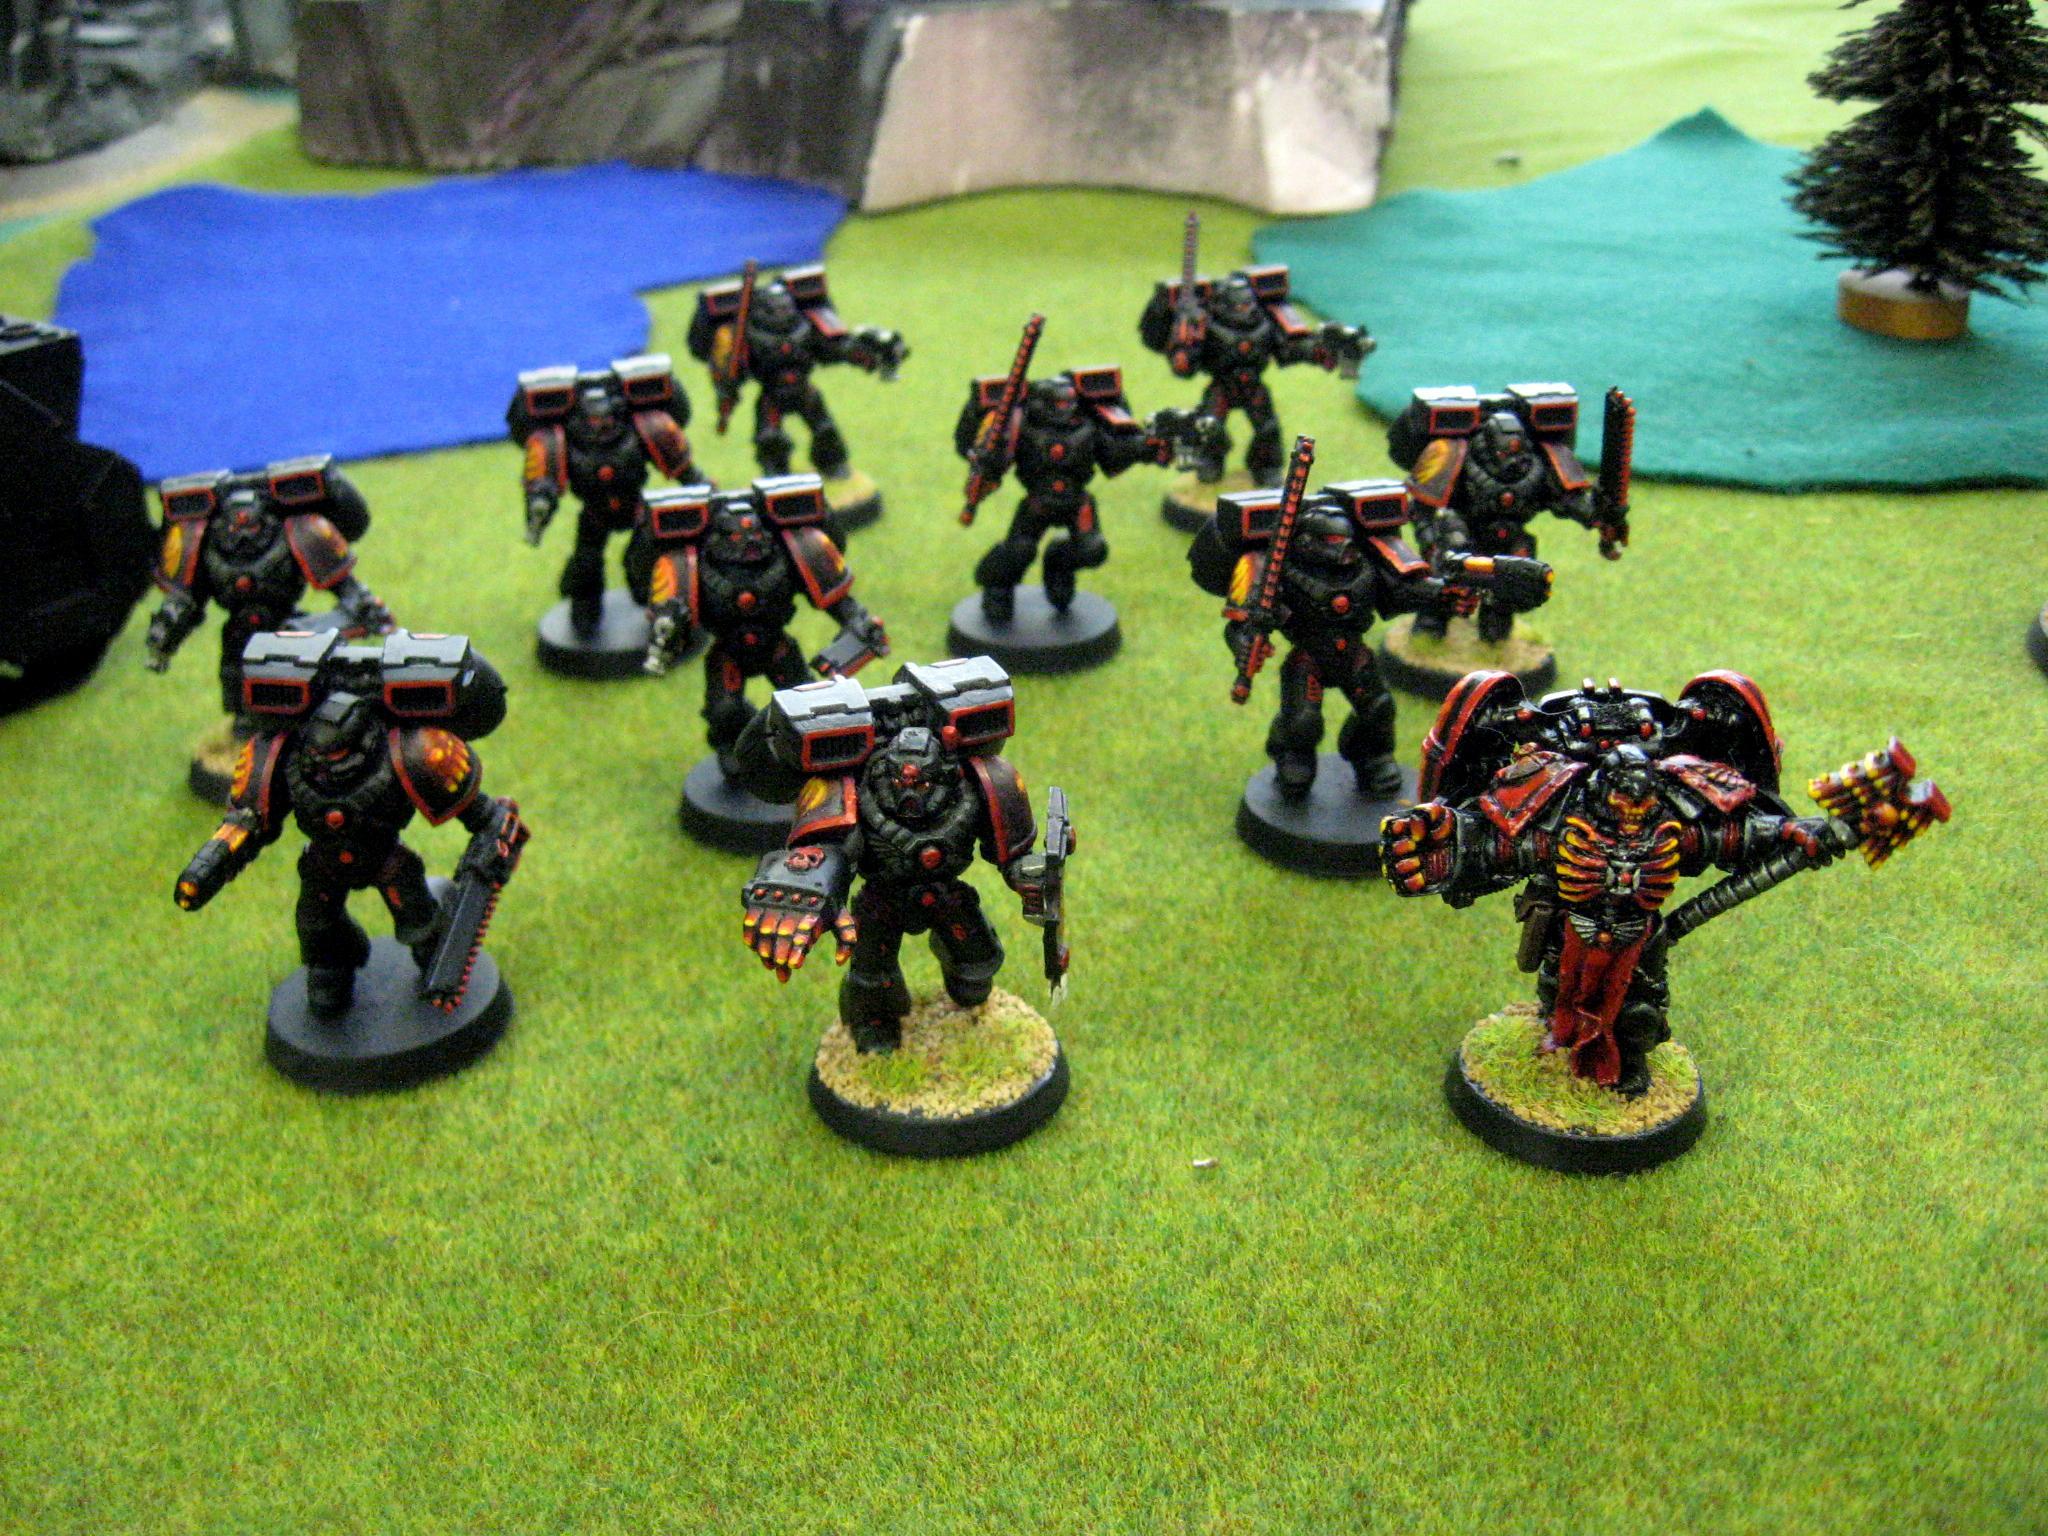 Assault Squad, Chapter, Custom, Dreadnought, Land Raider, Predator, Rhino, Salamanders, Space Marines, Tactical, Terminator Armor, Vanilla, Vulkan